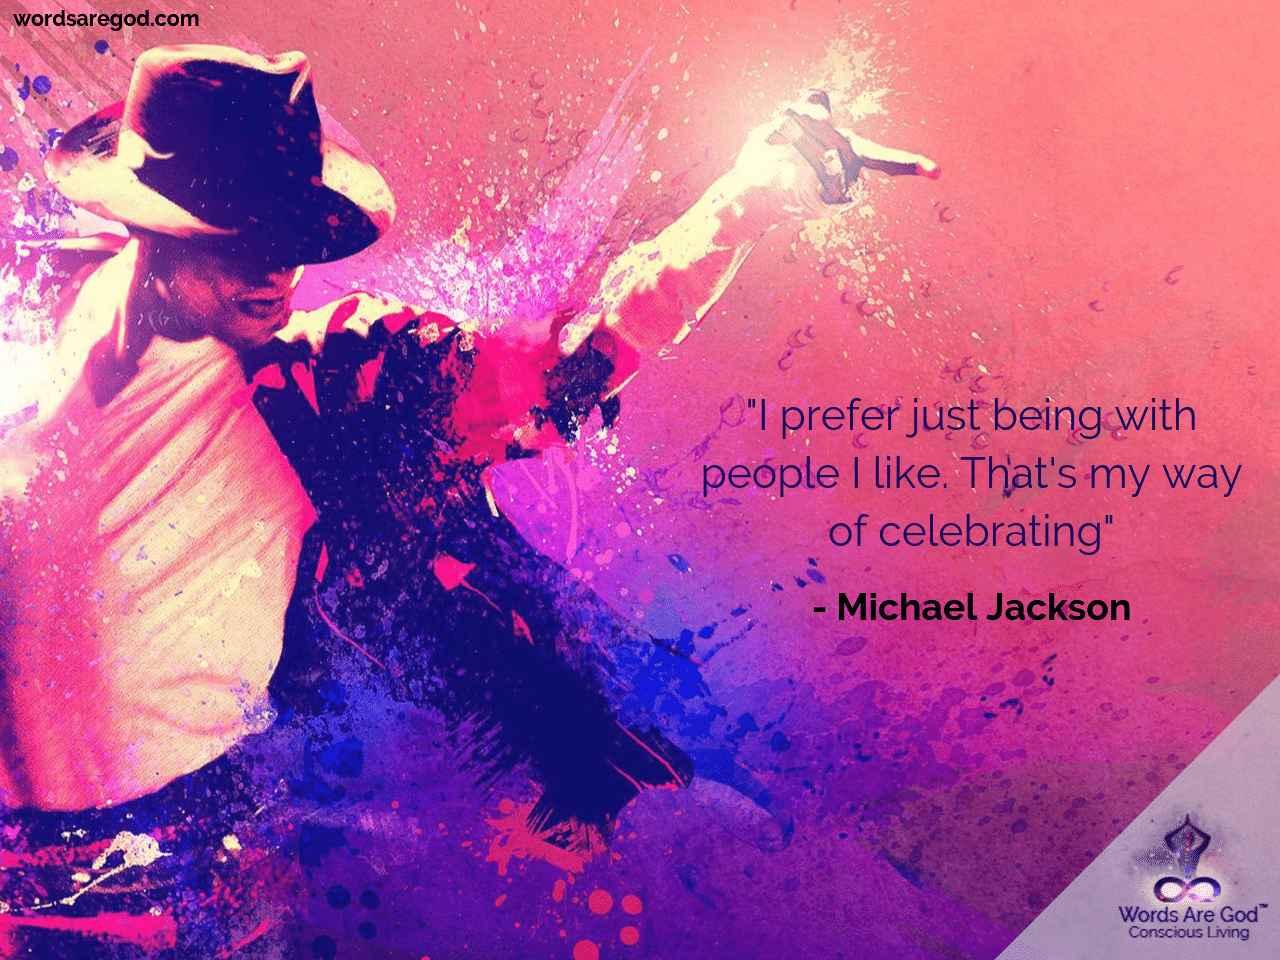 Michael Jackson Inspirational Quote